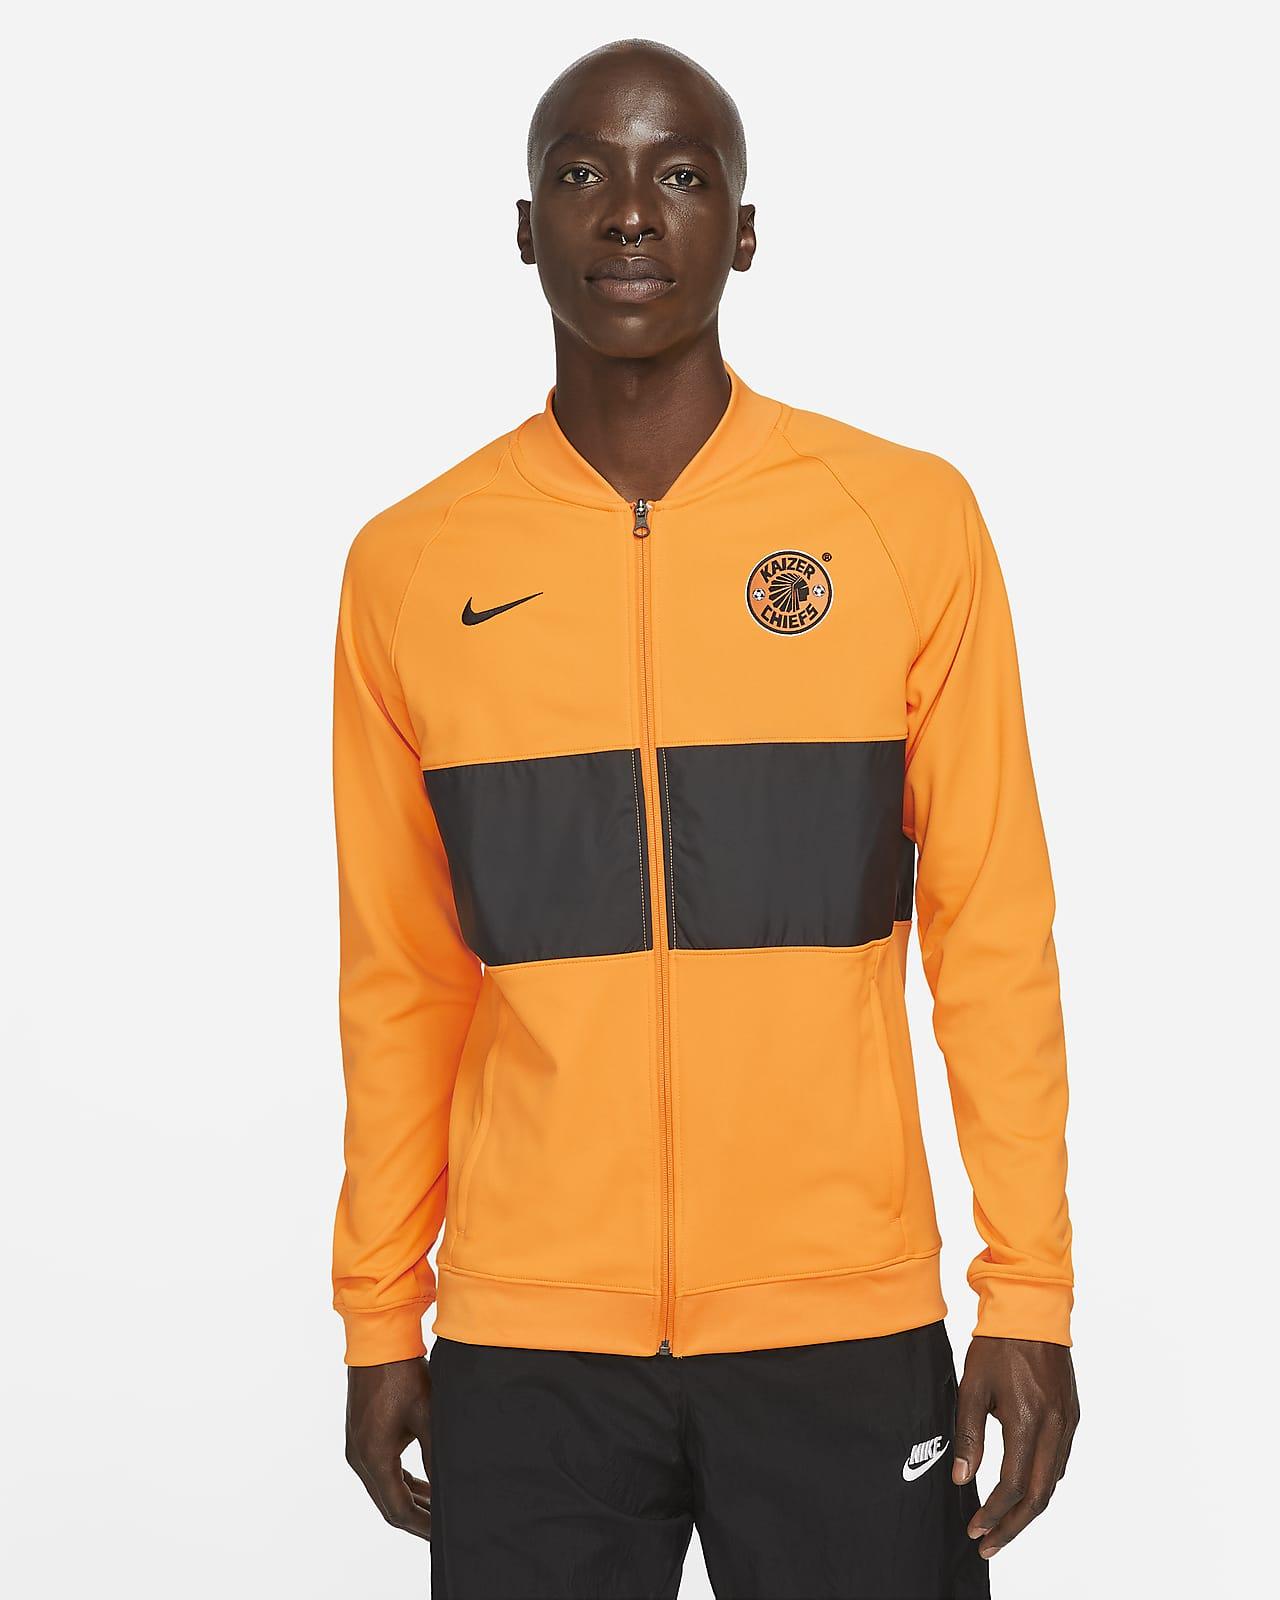 Kaizer Chiefs F.C. Men's Full-Zip Football Jacket